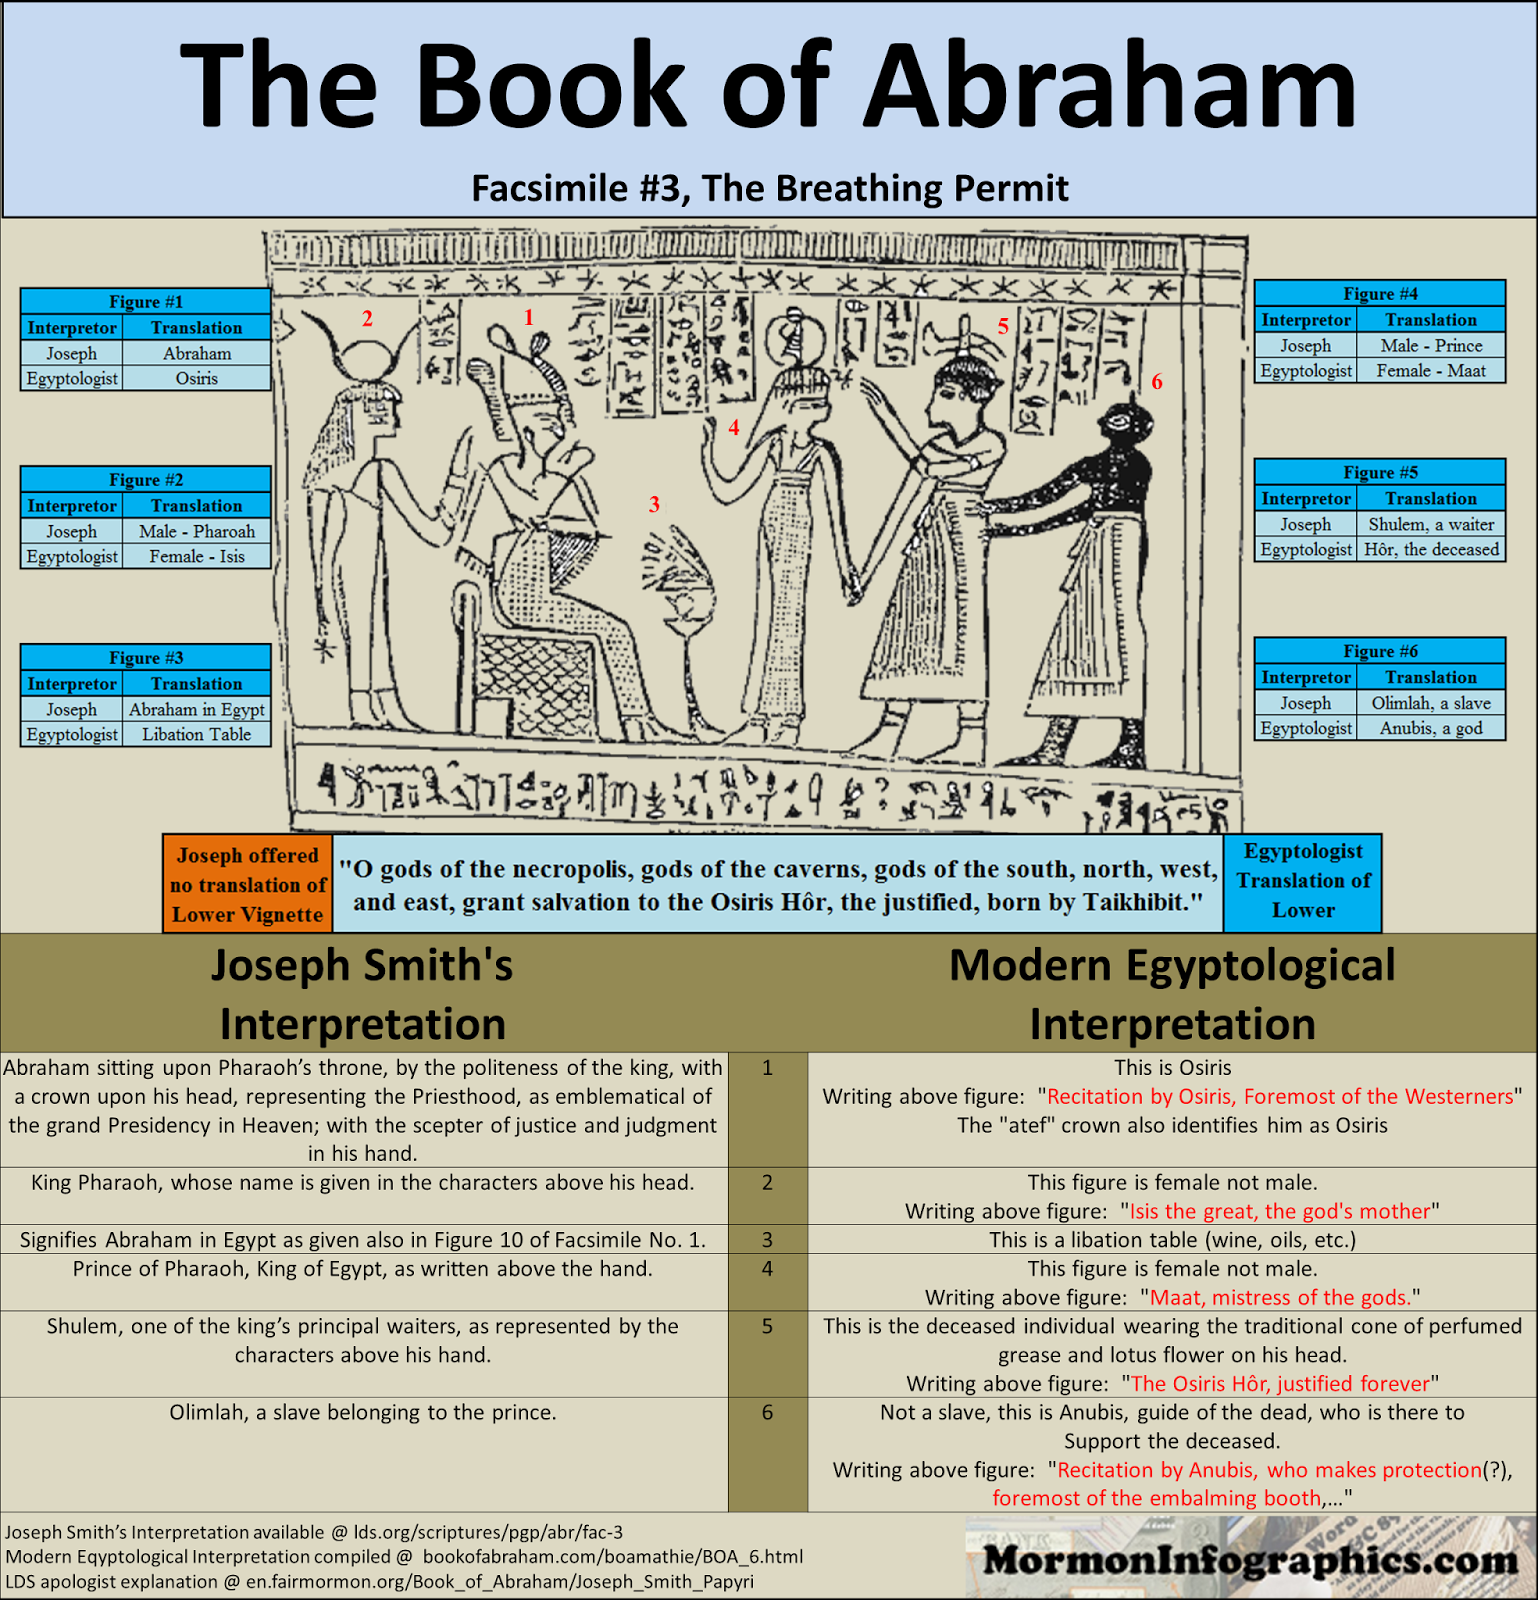 Mormon Infographics Book Of Abraham Facsimile 1 Examined